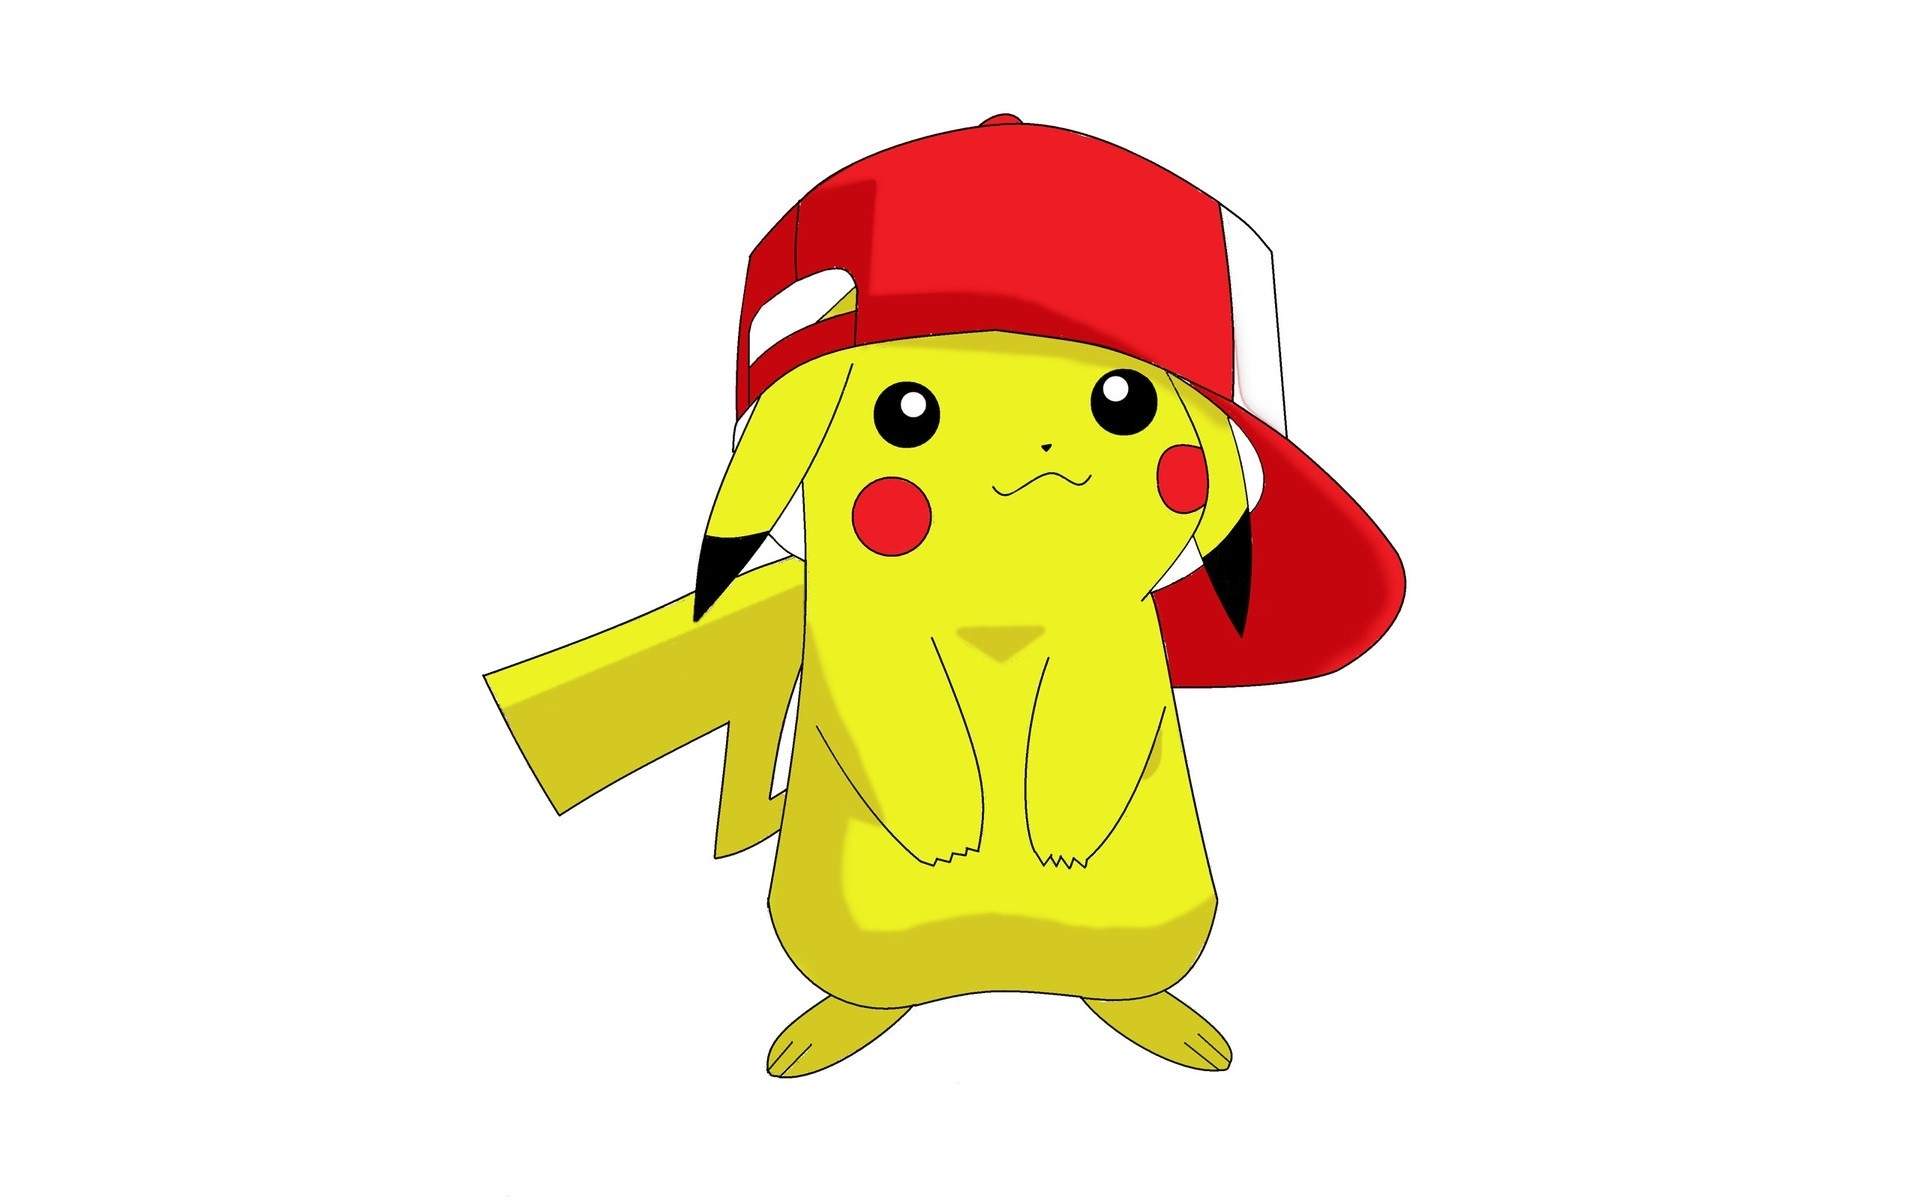 anime manga game cute yellow cap wallpapers anime   download 1680x1050